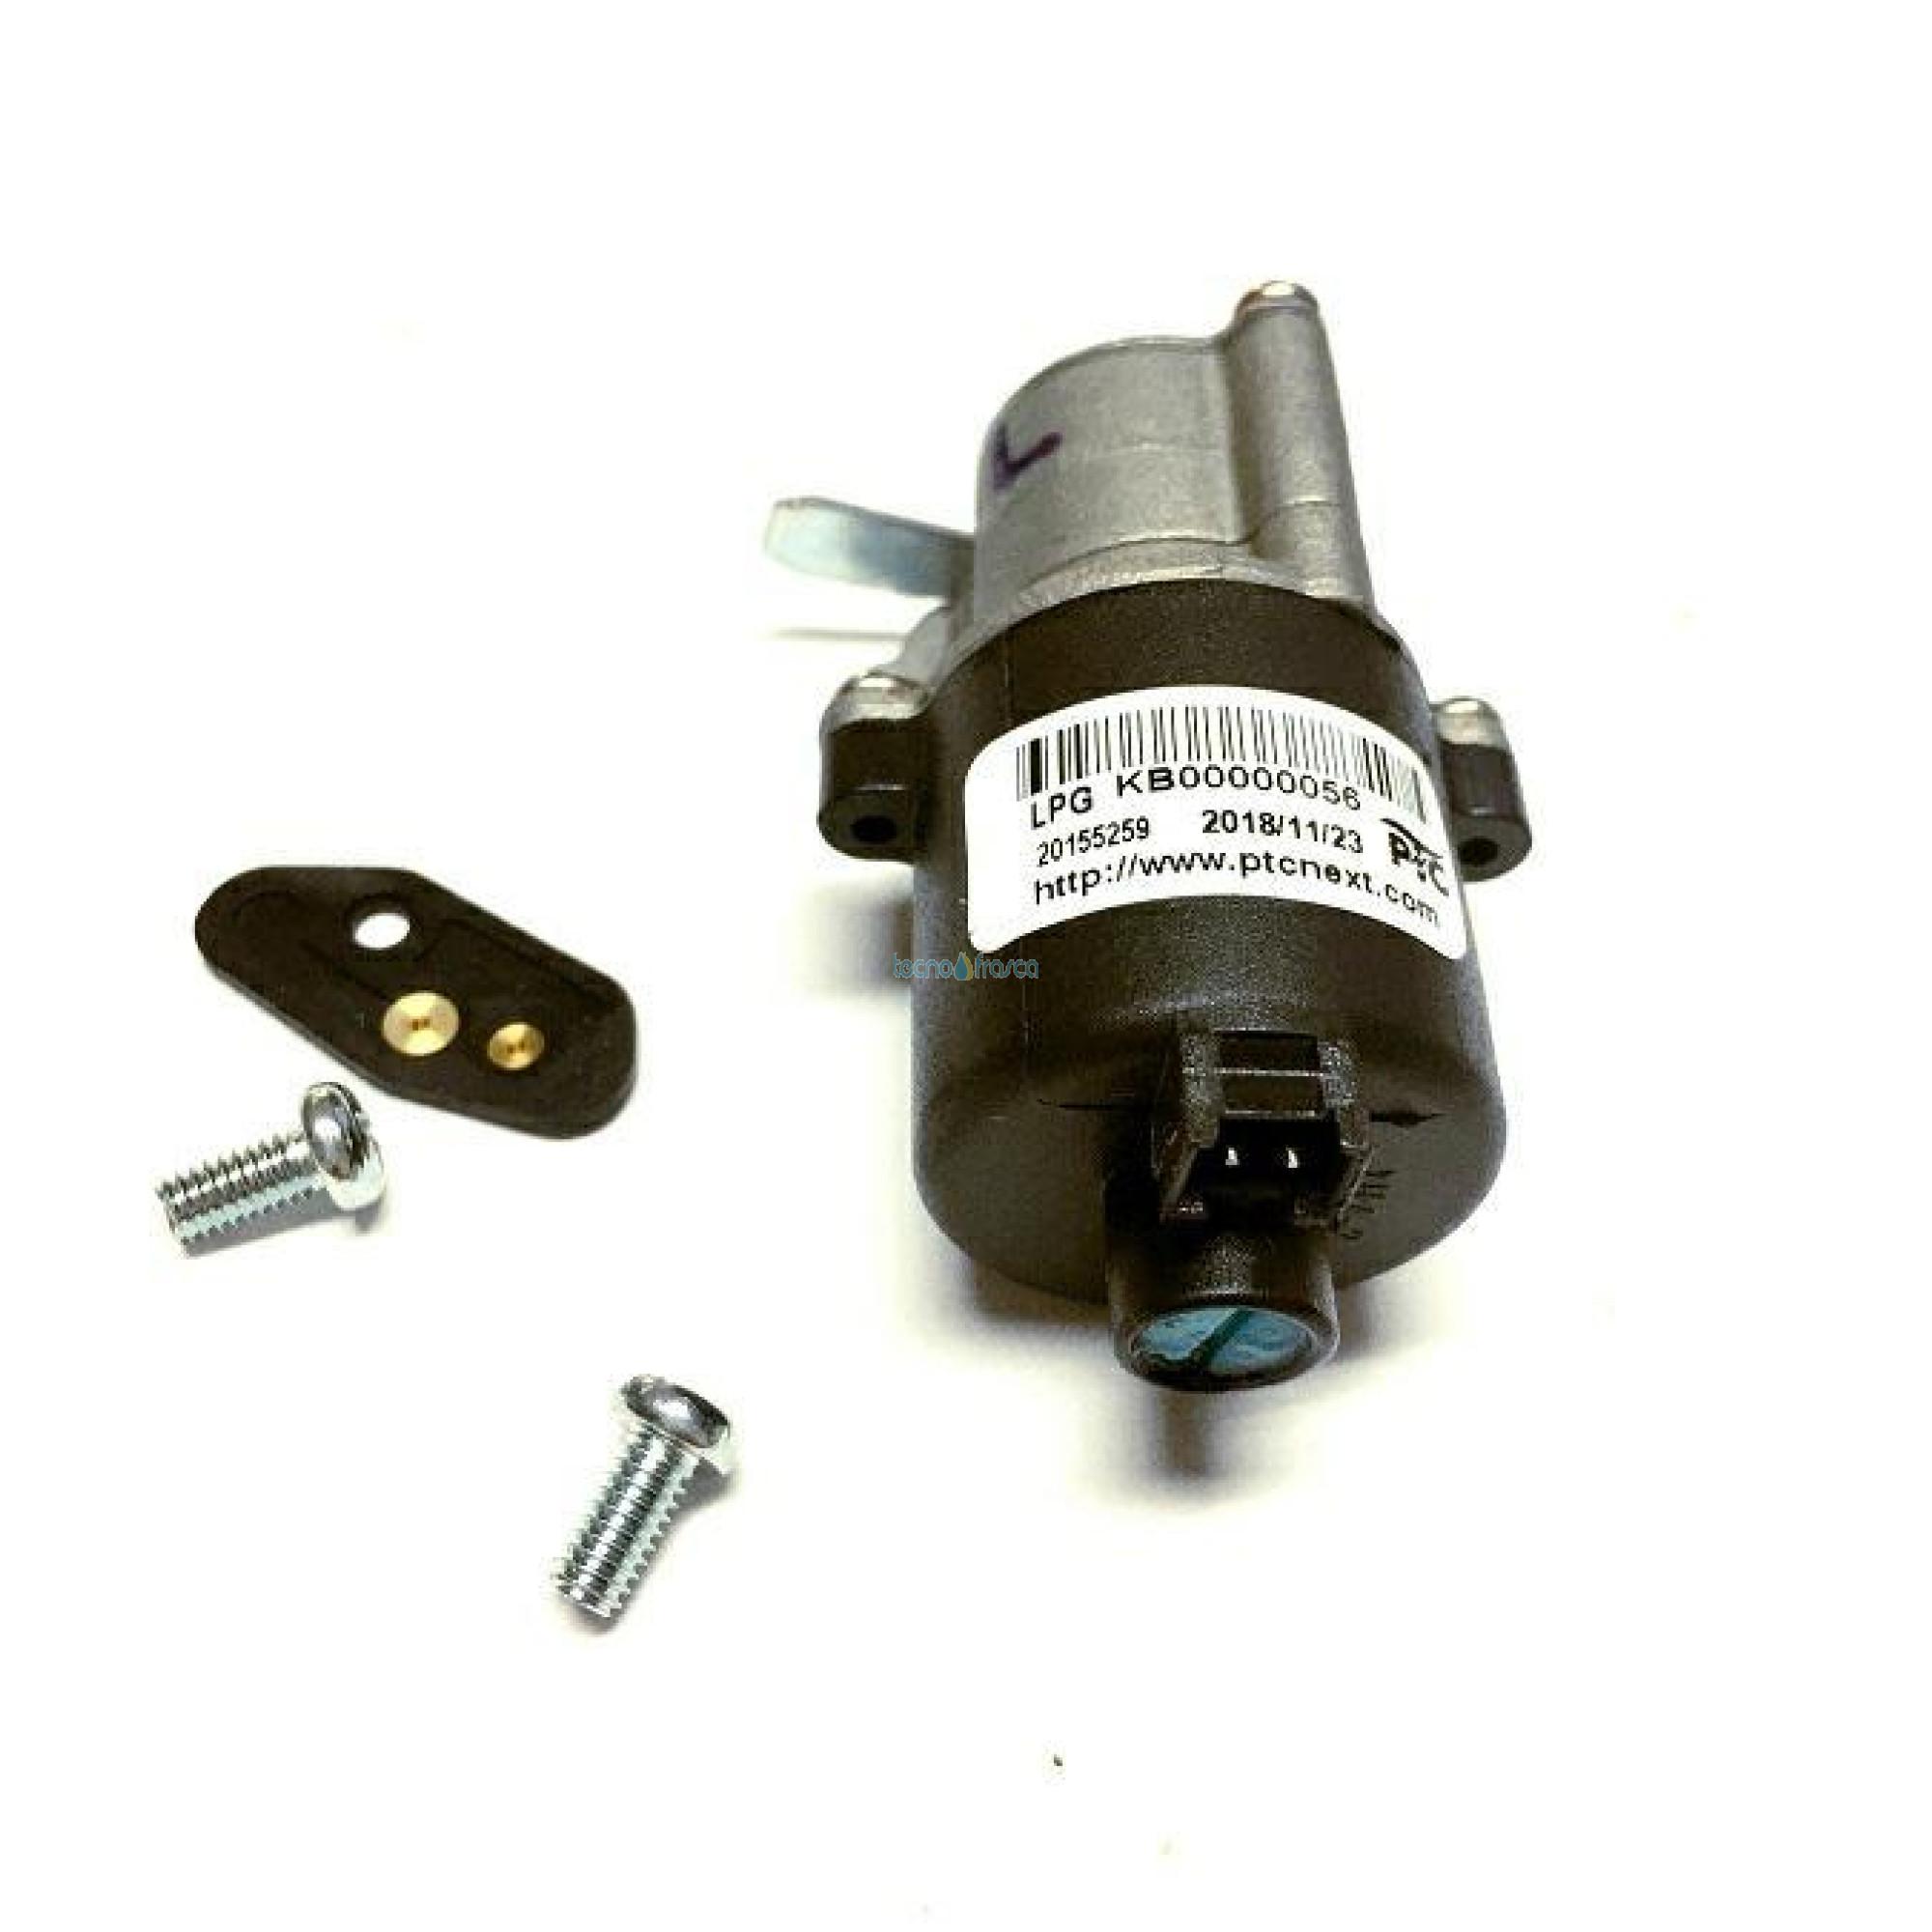 Beretta bobina modulatore gpl scaldabagno fonte 2 lx11 20155763